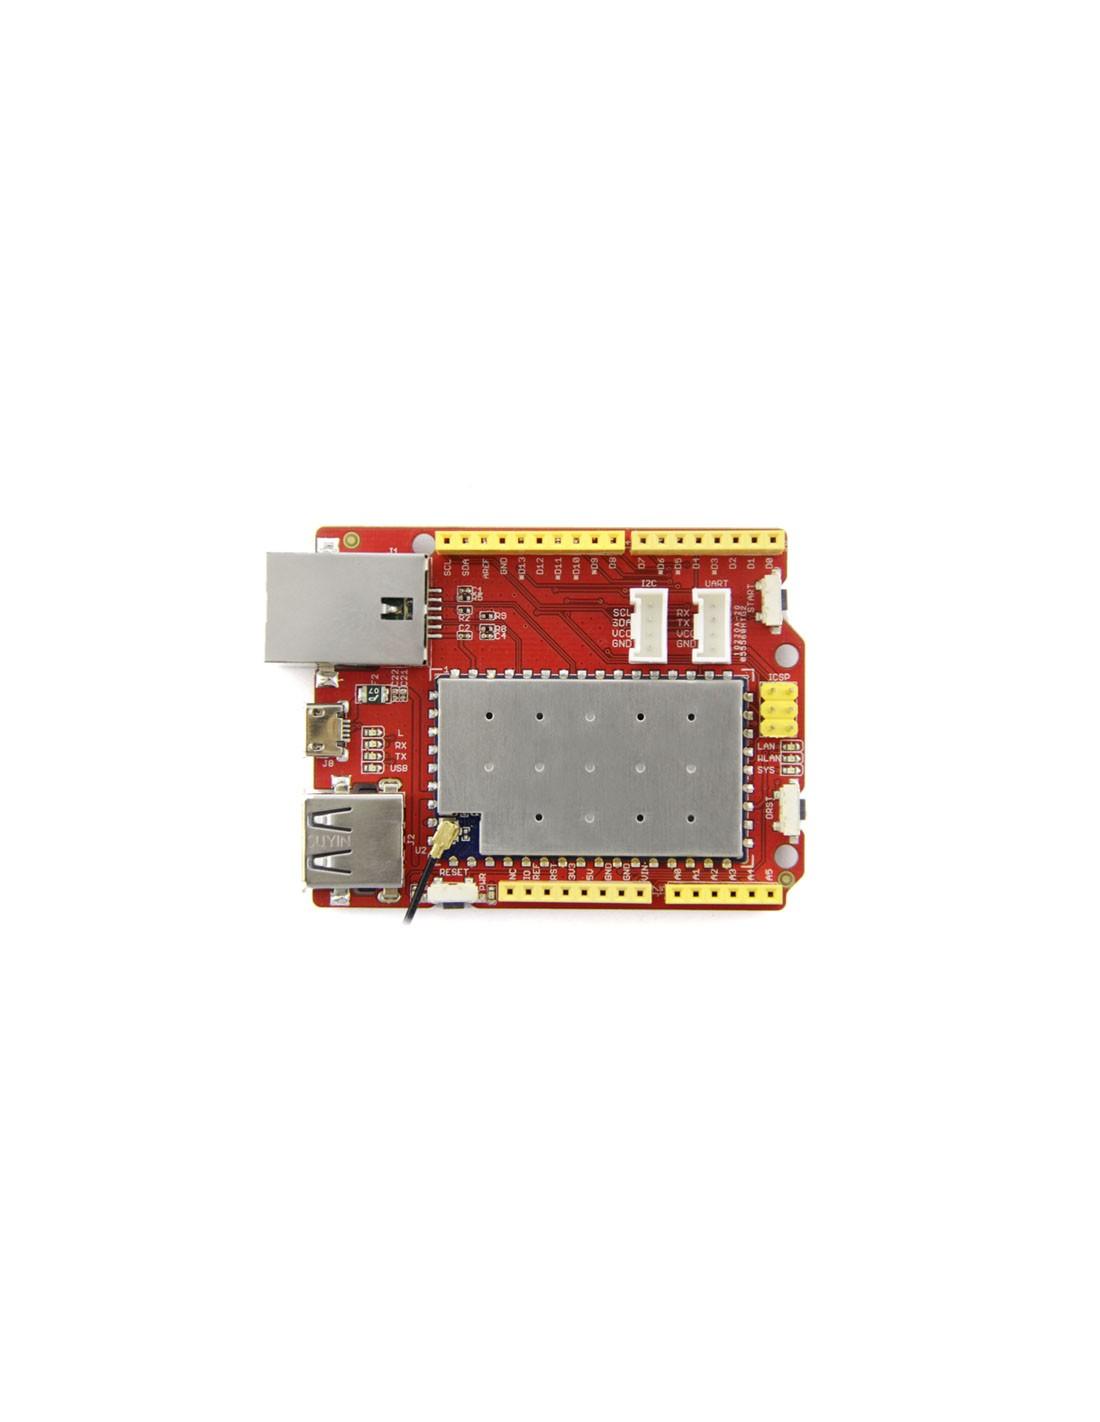 Seeeduino Cloud (Arduino compatible Yun openWRT controller)